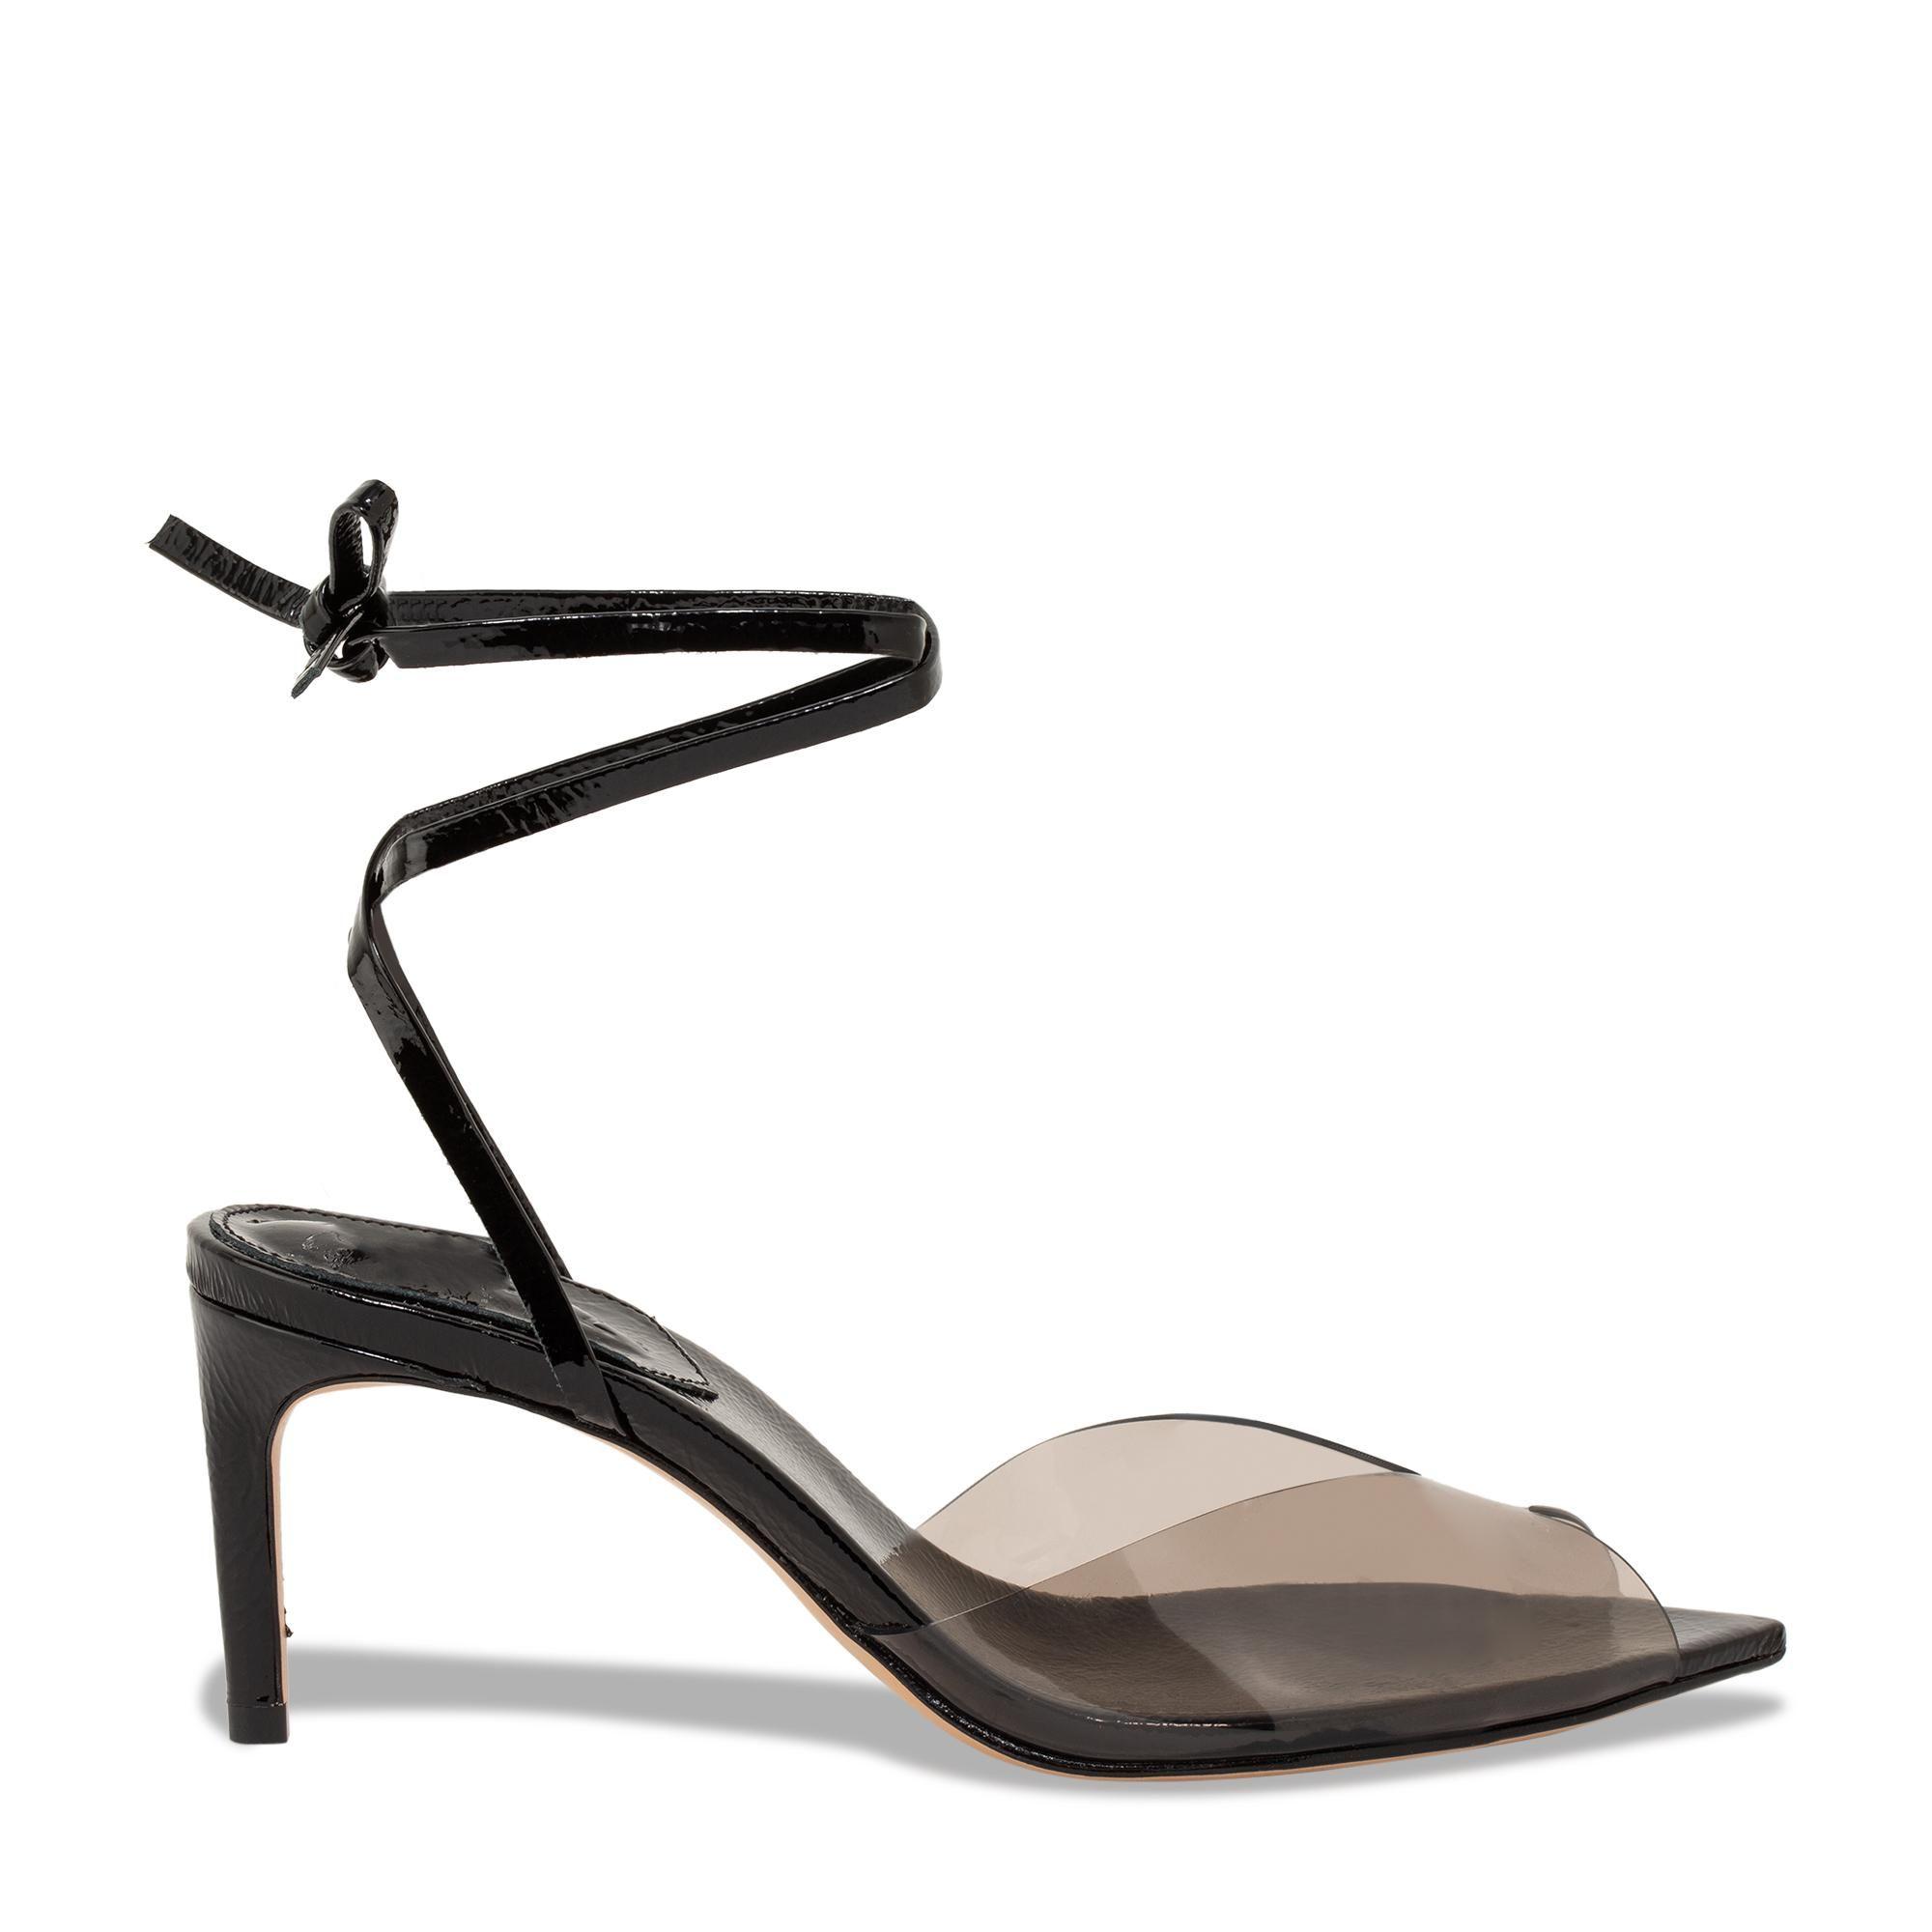 Leather tie sandals